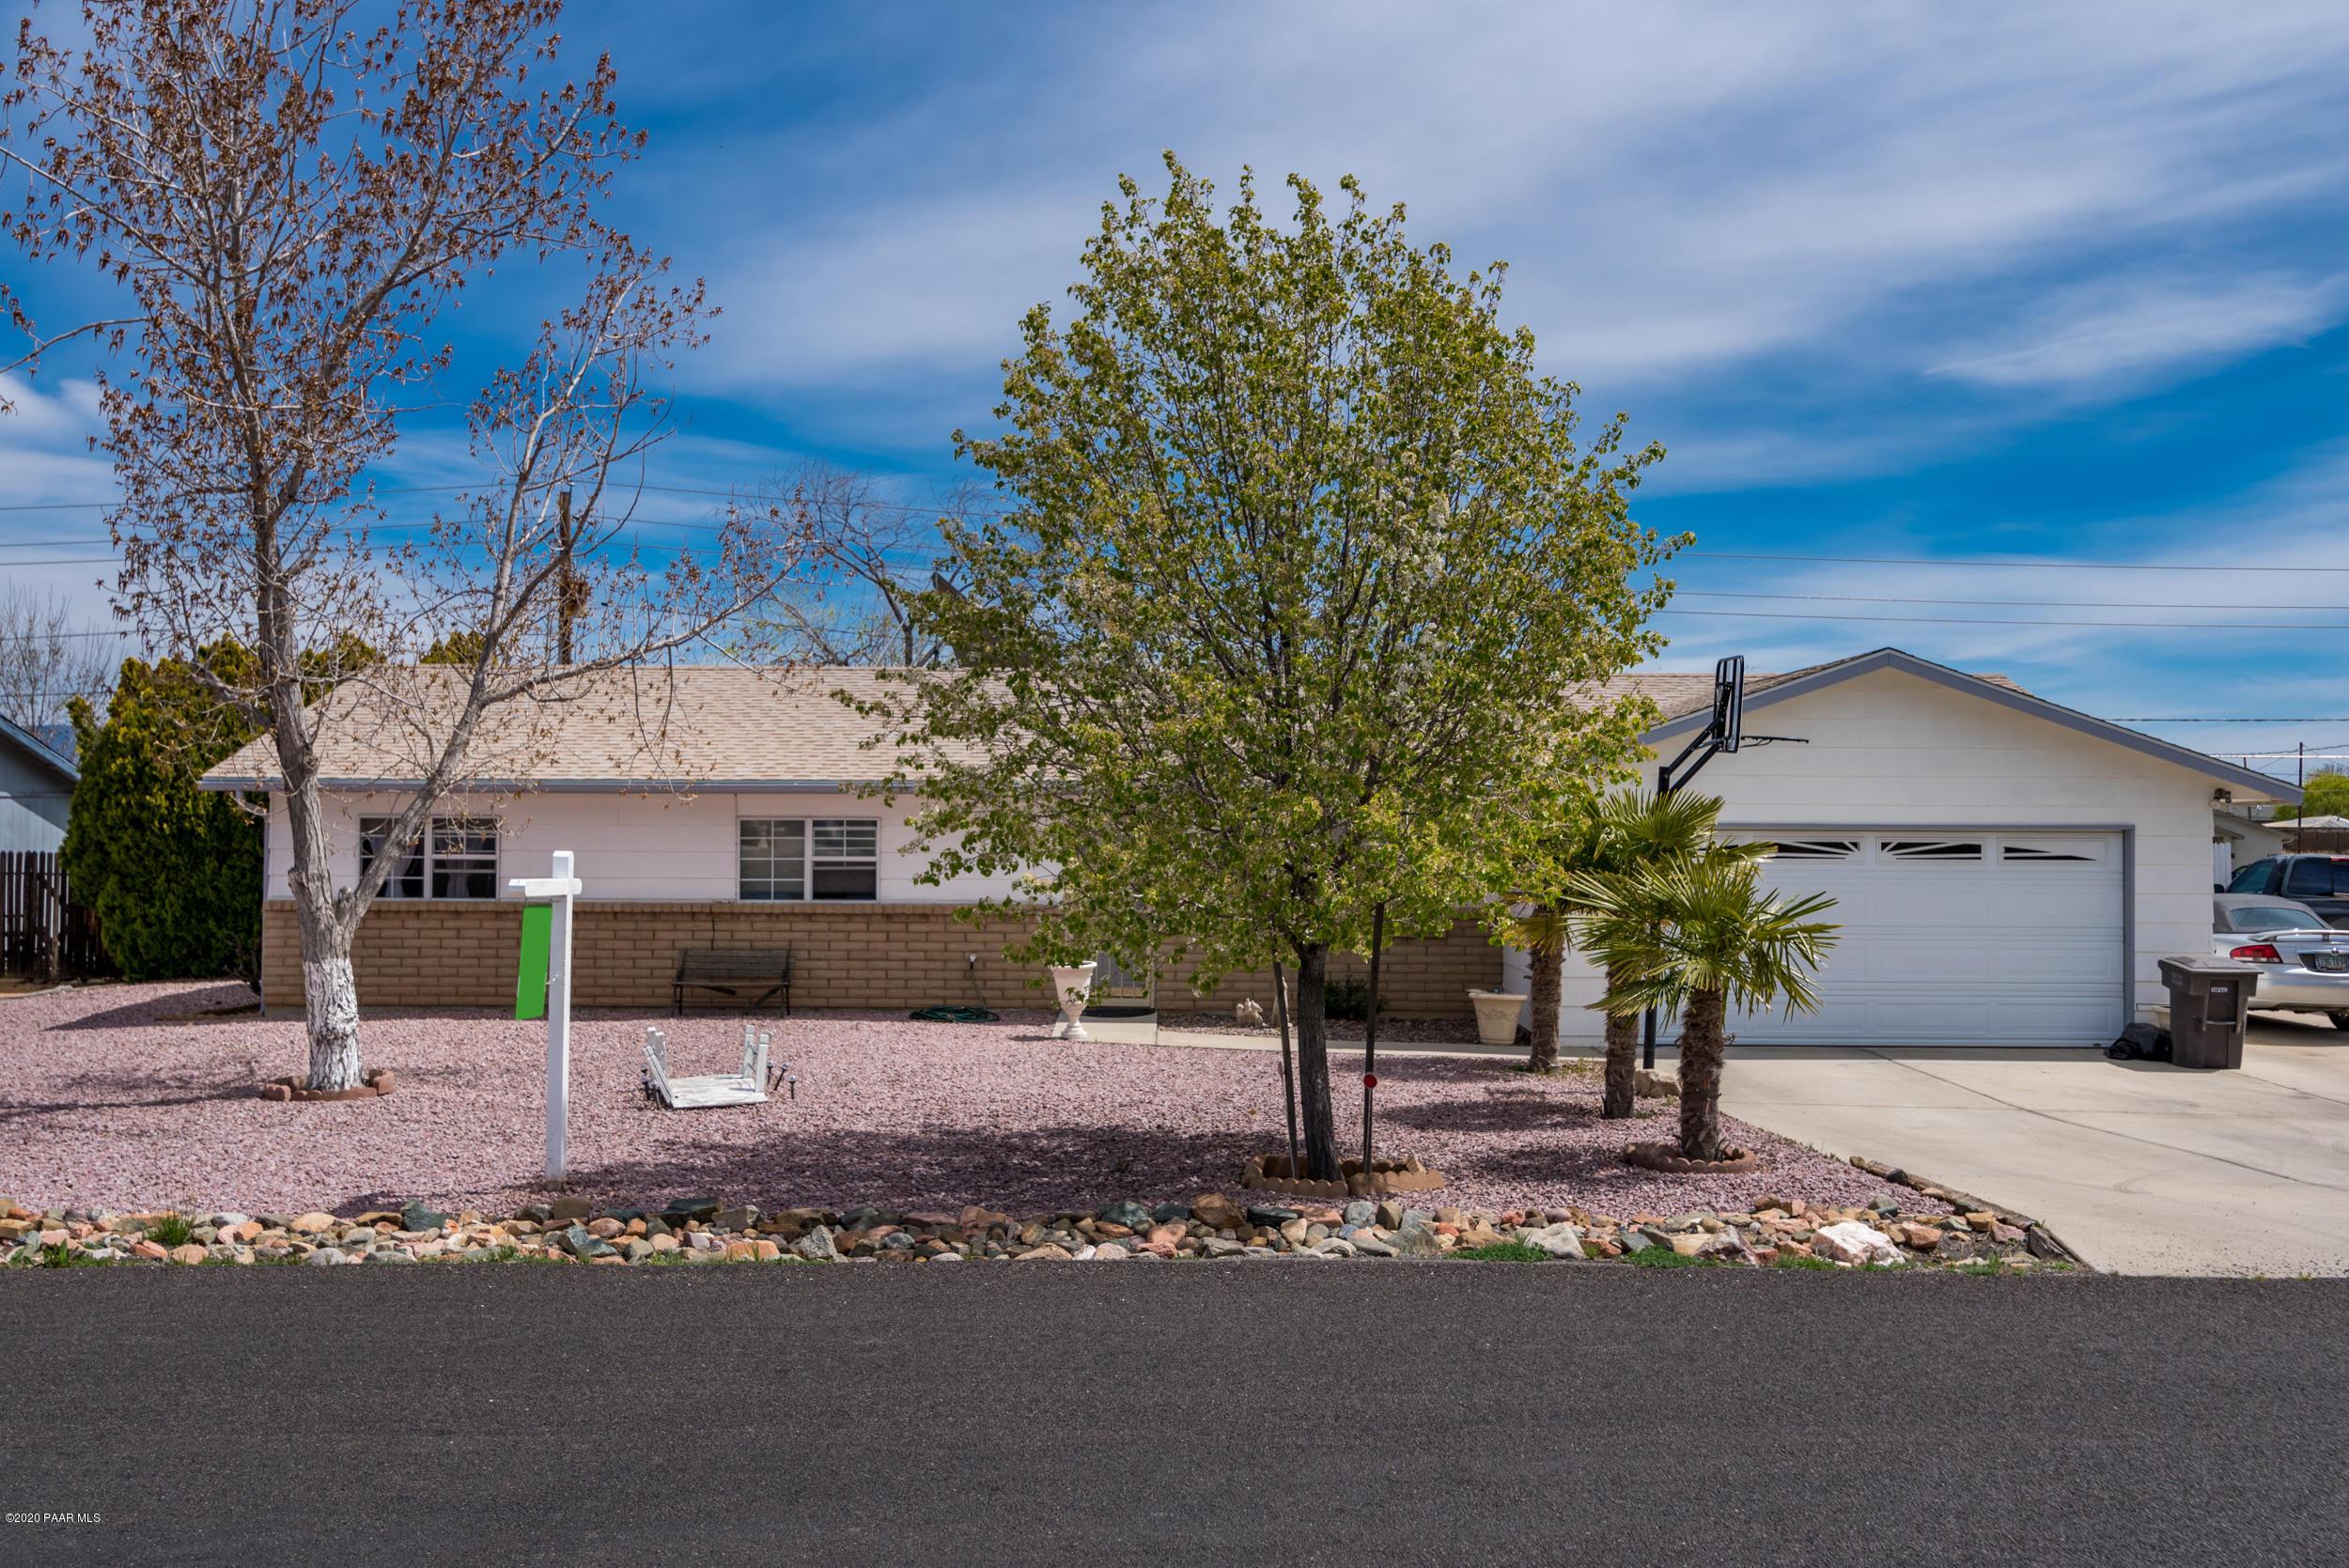 4383 N Tonto Way, Prescott Valley in Yavapai County, AZ 86314 Home for Sale